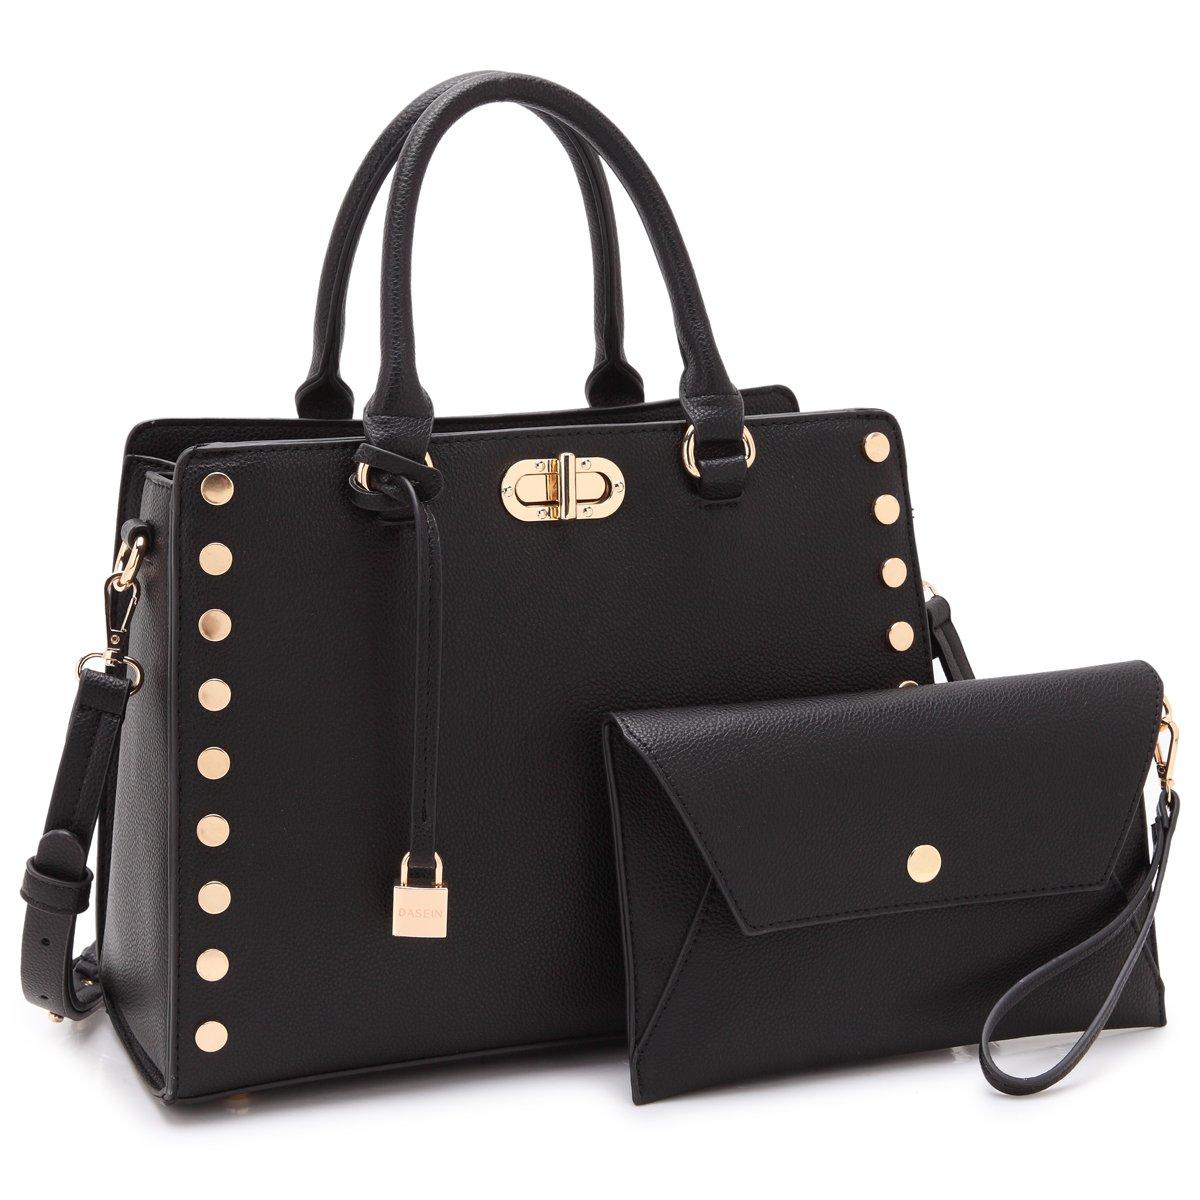 bd619a8b0770 Designer Handbags Purses For Women Tassel Lock Satchel Bags Top Handle  Shoulder Bag With Matching Wallet  Handbags  Amazon.com